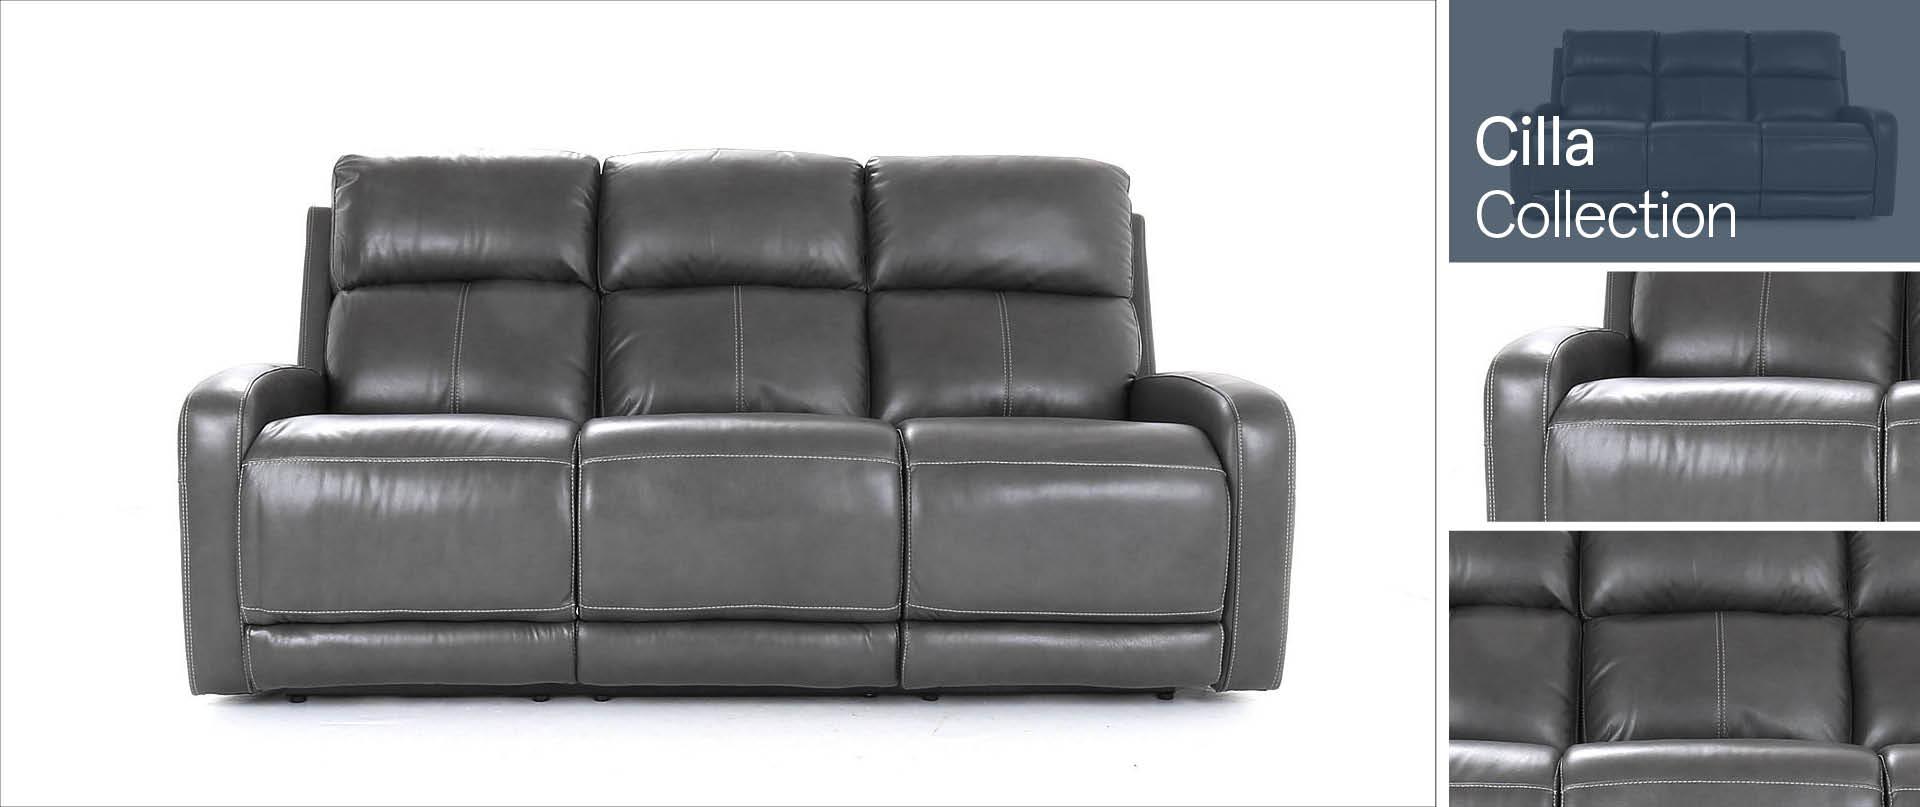 Cilla Leather Sofa Ranges